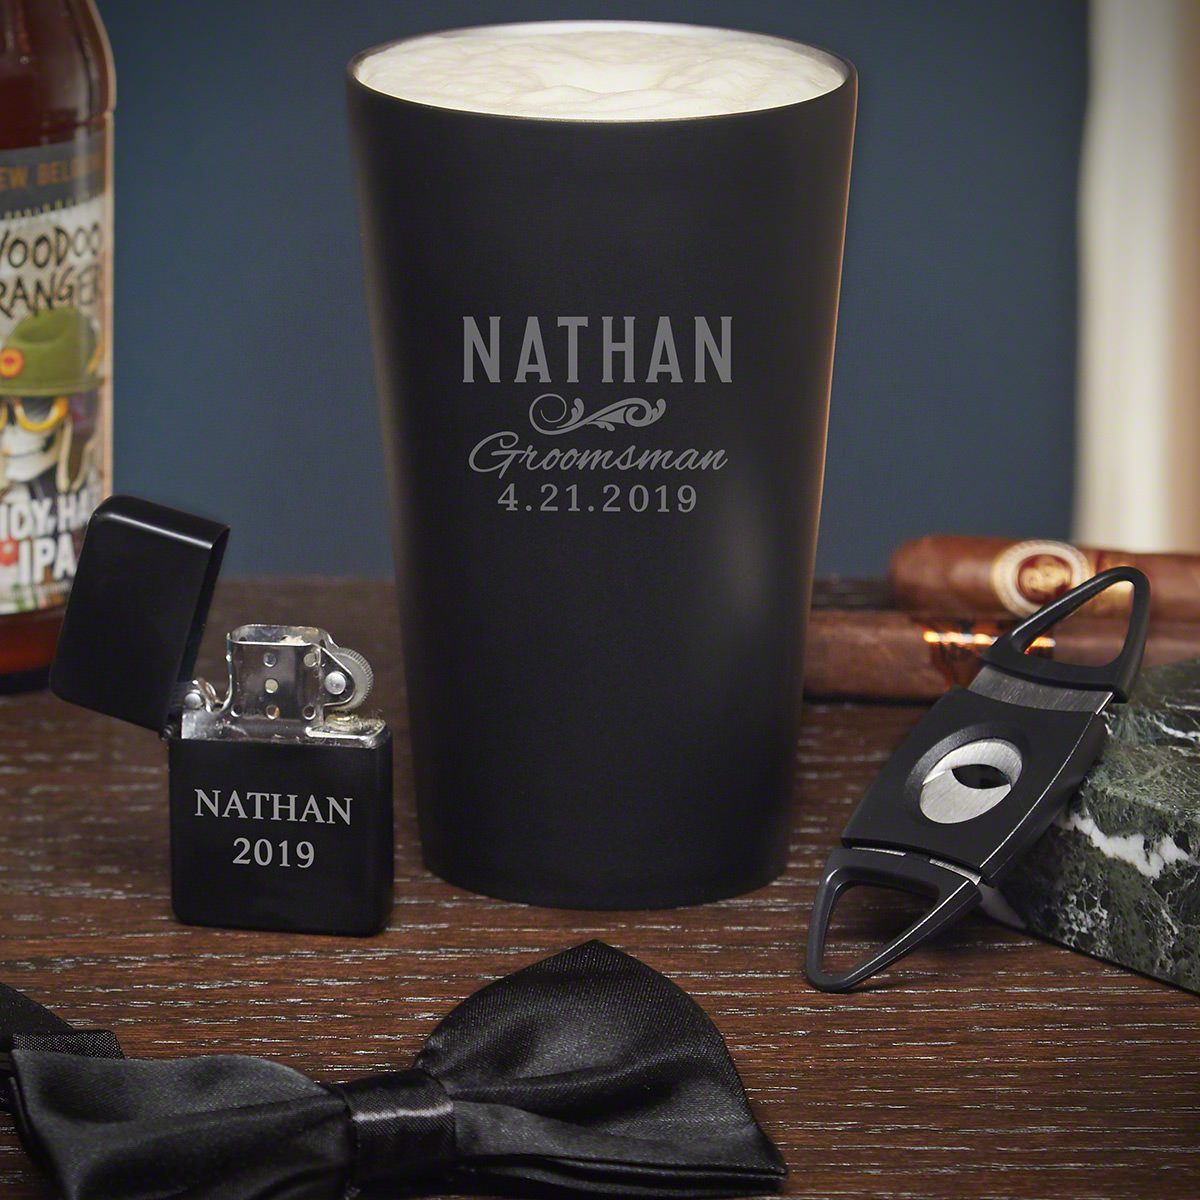 Classic Groomsman Personalized Groomsmen Gift Set